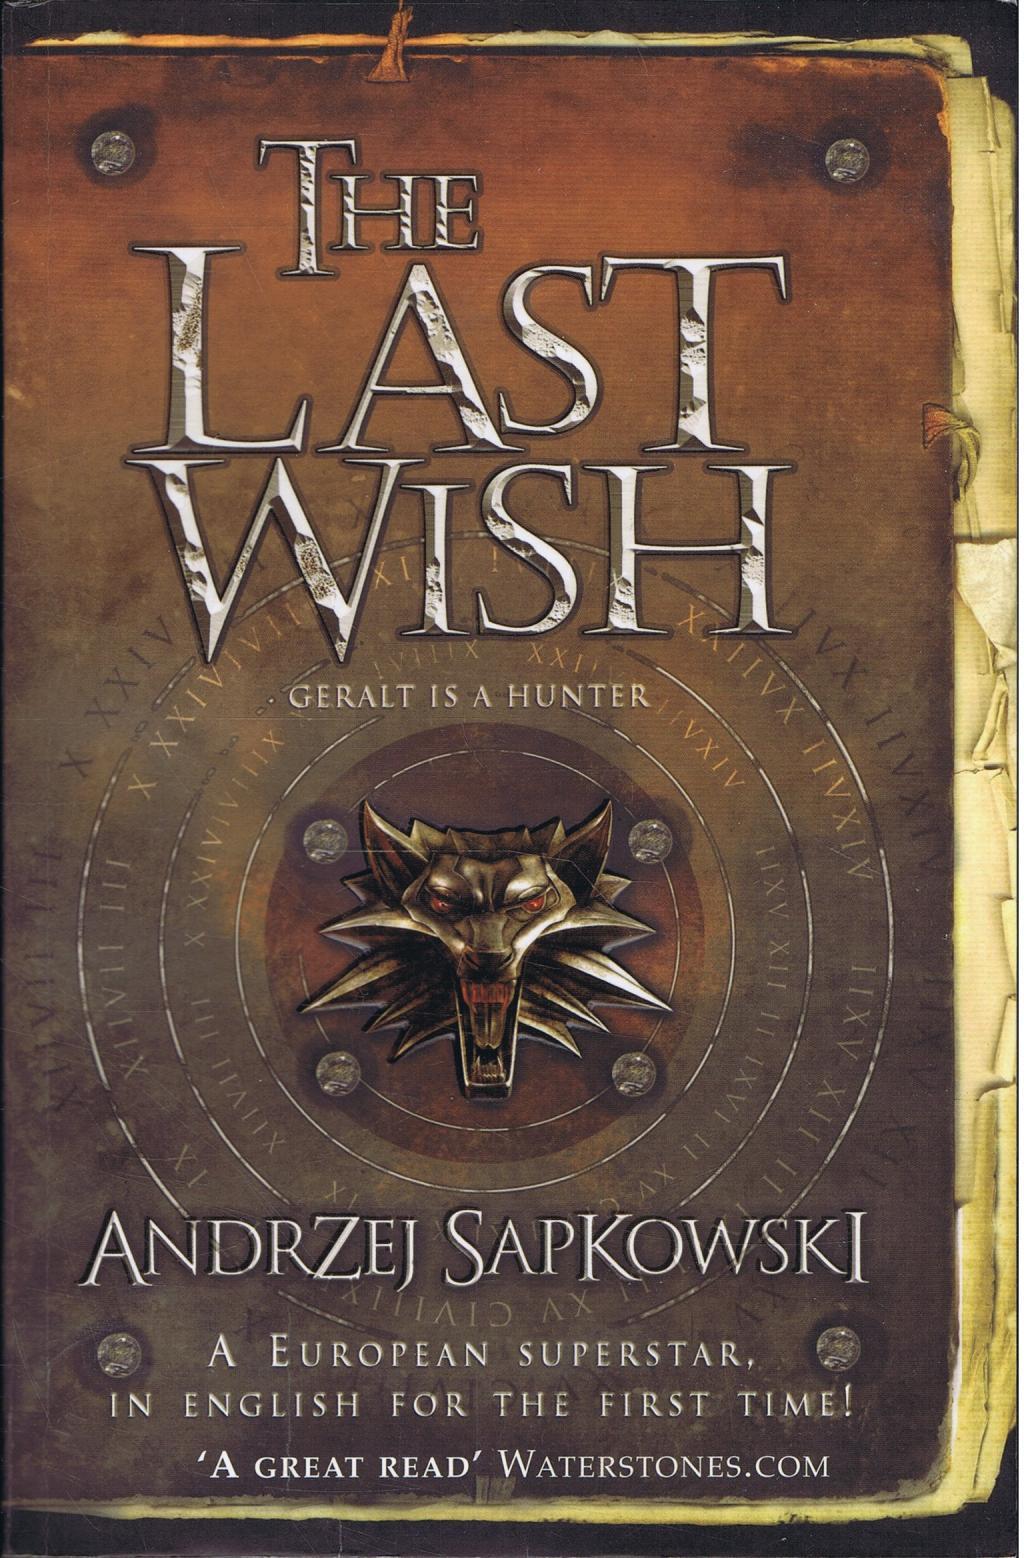 The Last Wish av Andrzej Sapkowski (Häftad (Paperback)) - Fantasyhyllan